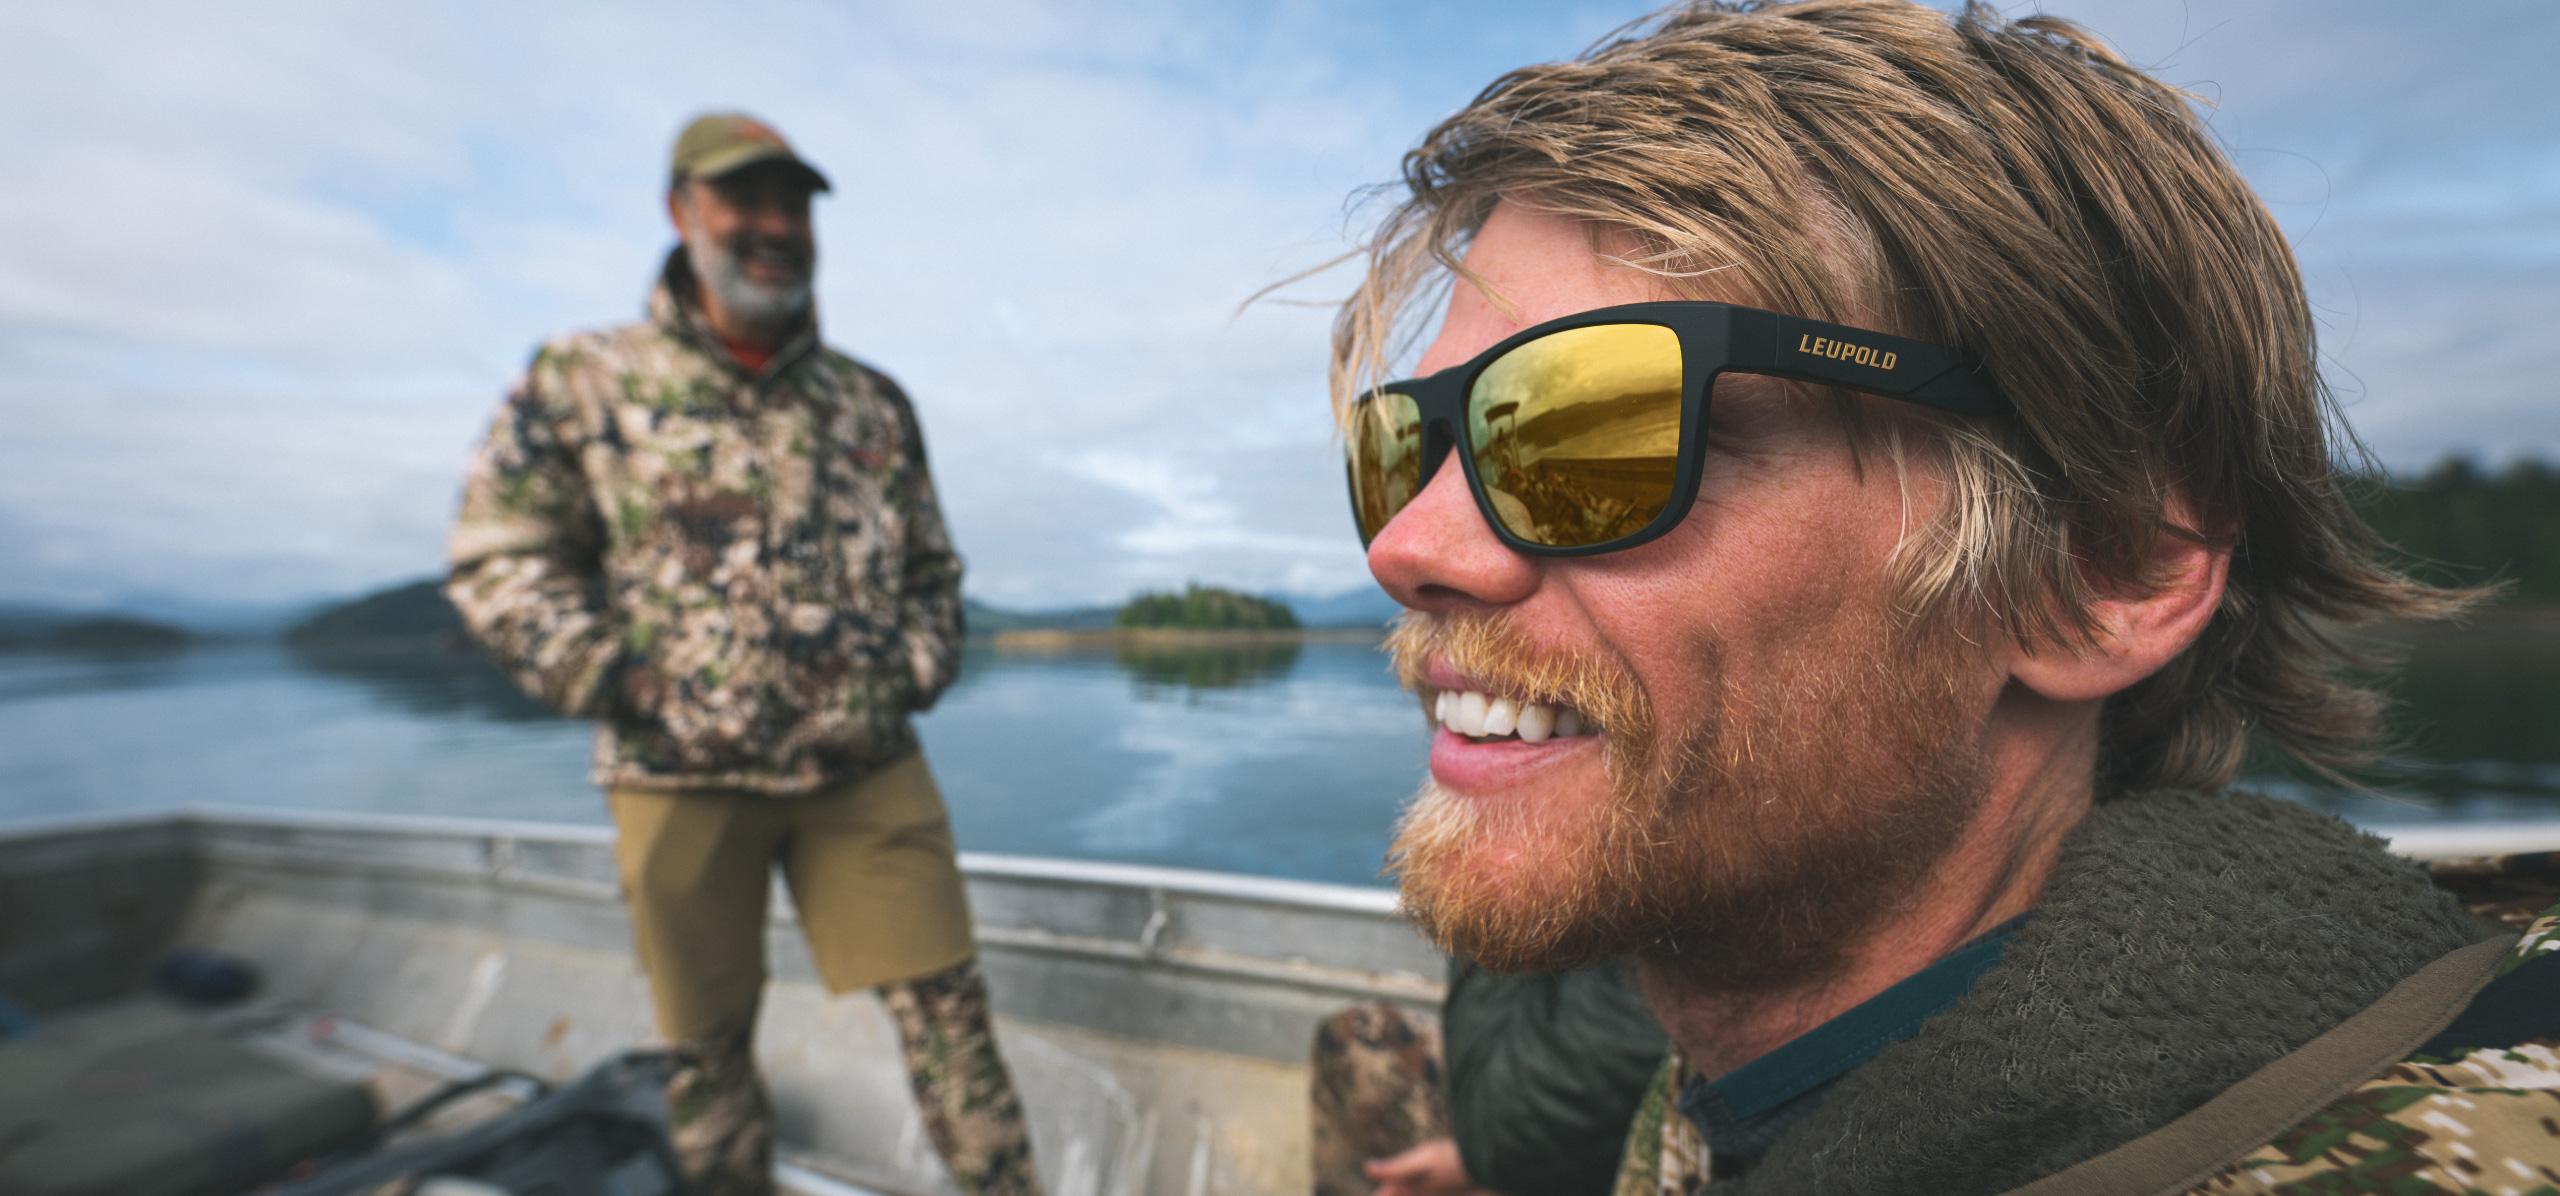 hunter wears leupold katmai eyewear on boat